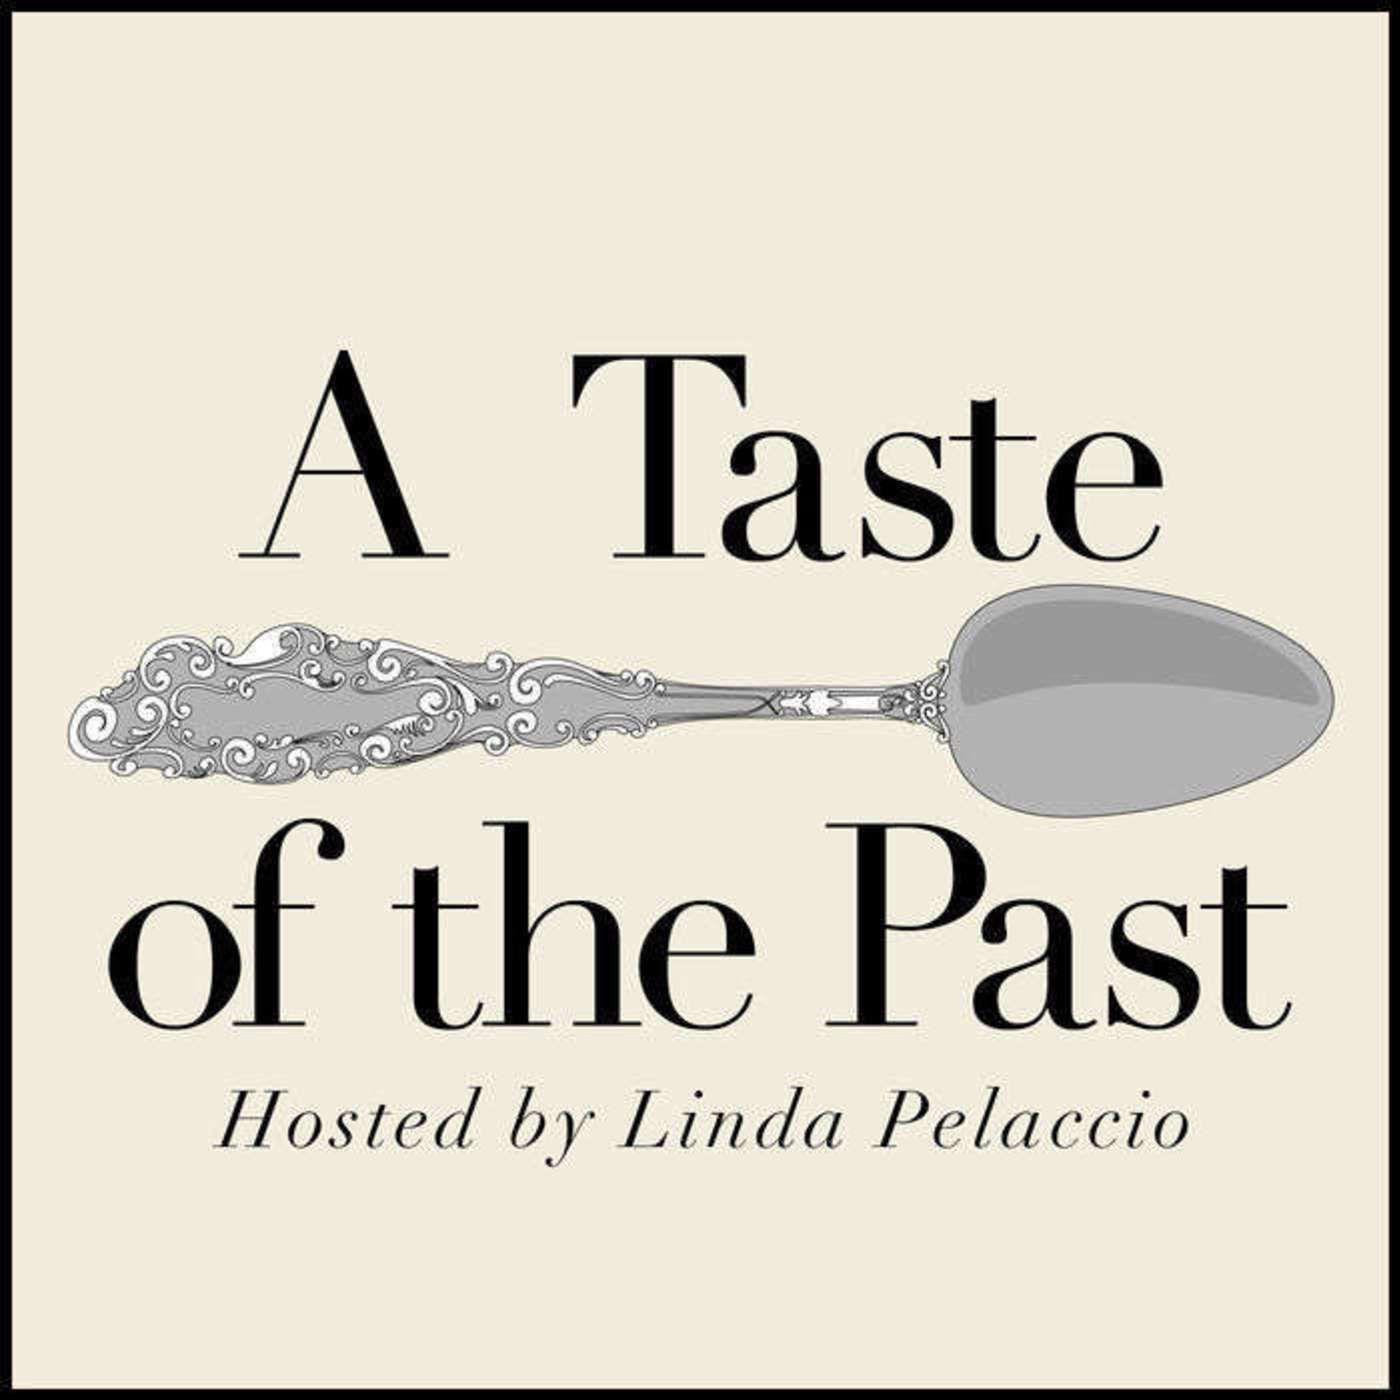 Episode 202: Sugar and its Dark History